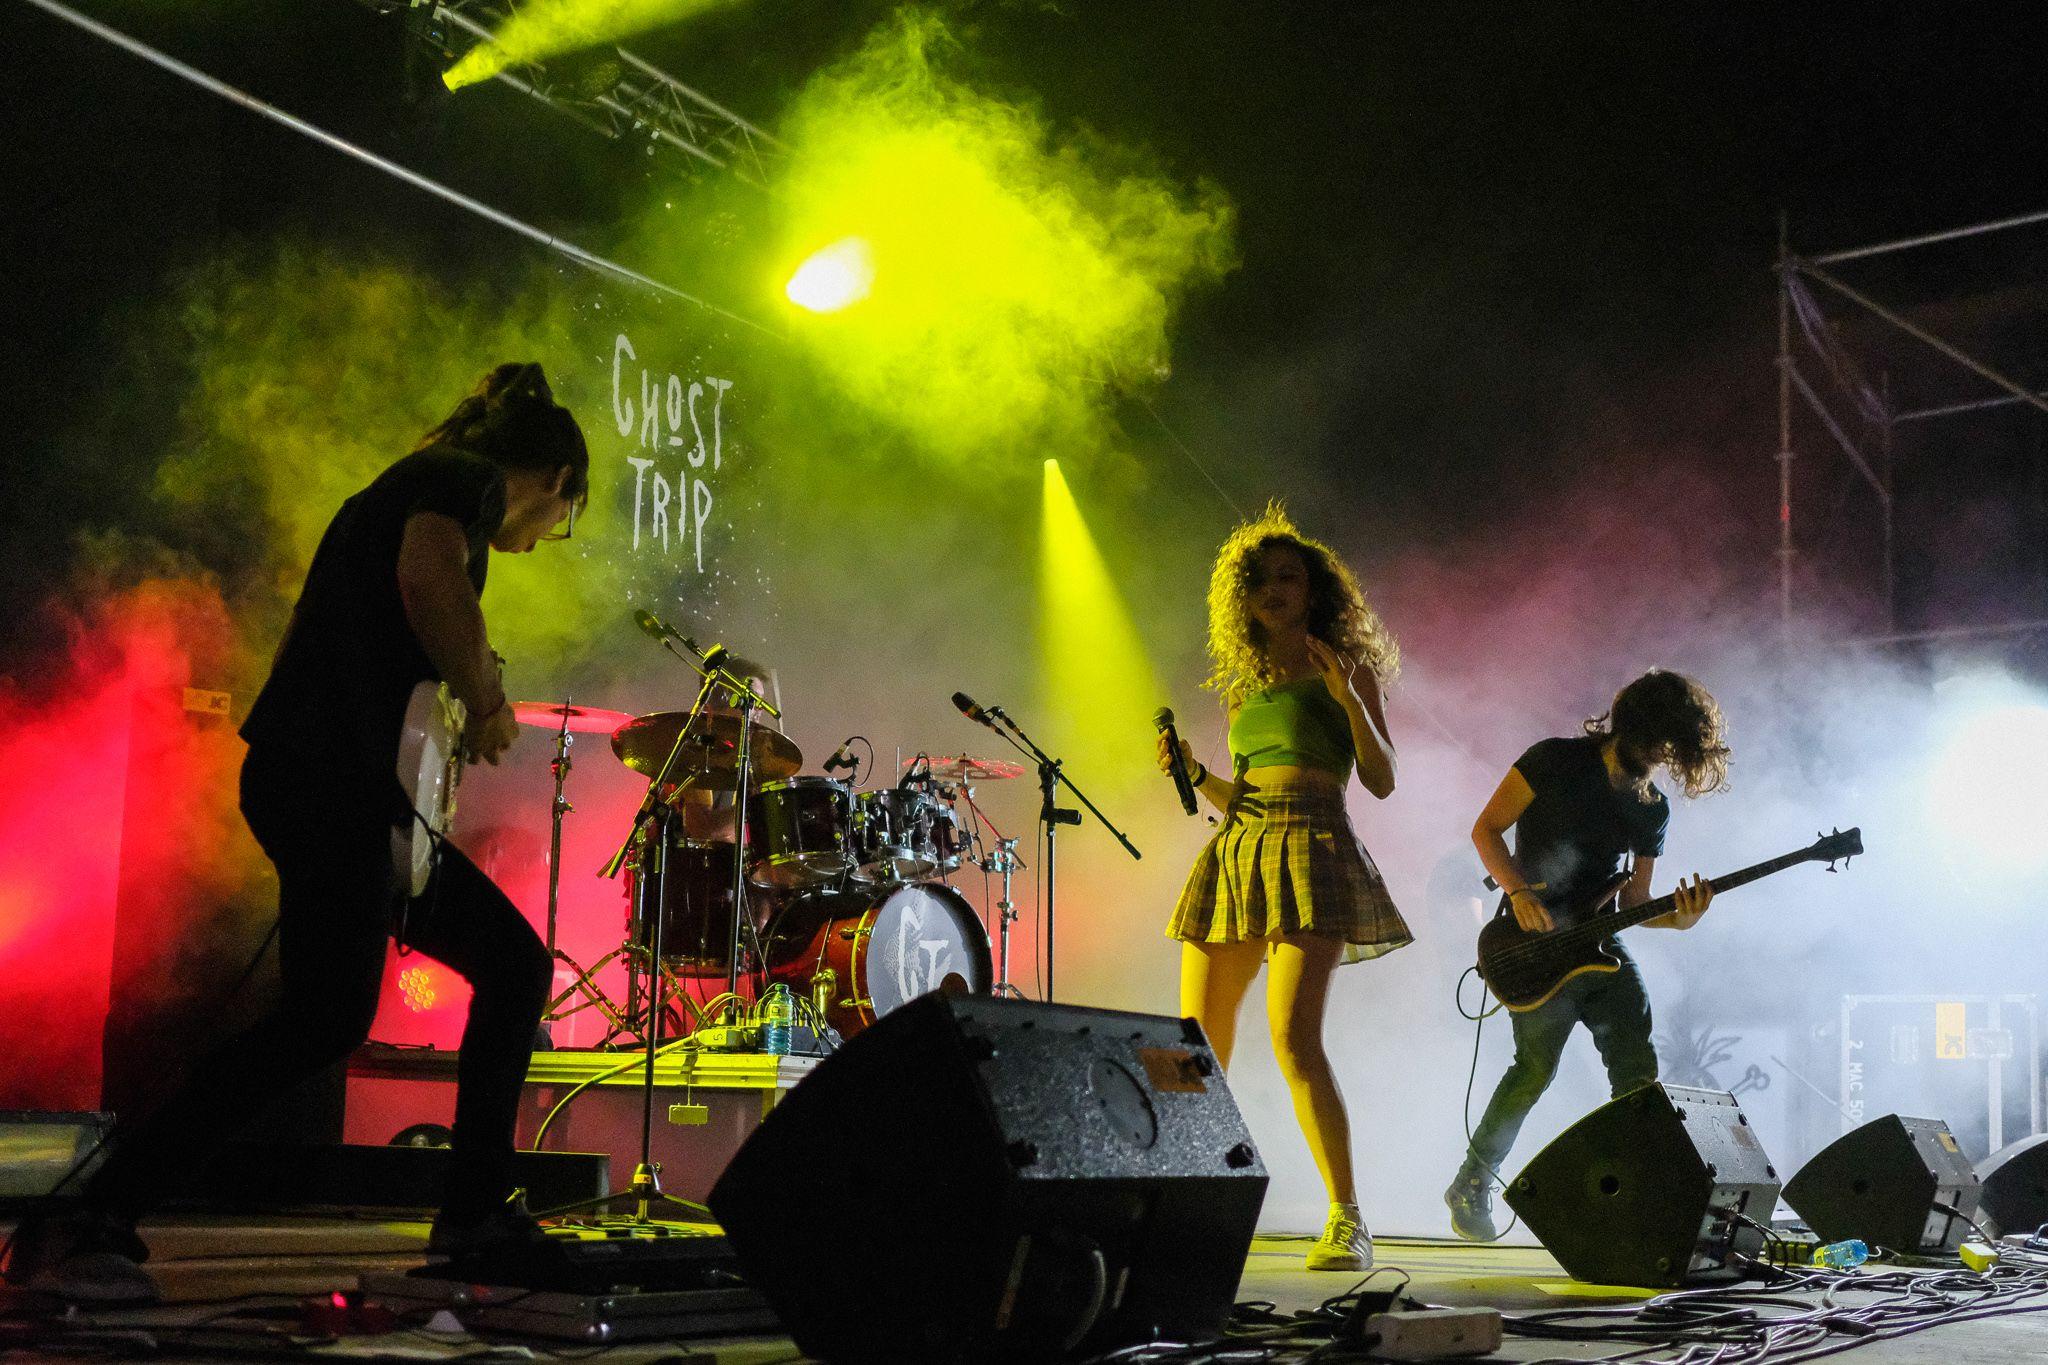 Concert de Ghost Trip a la DesPlaça. Foto: Alex Gómez